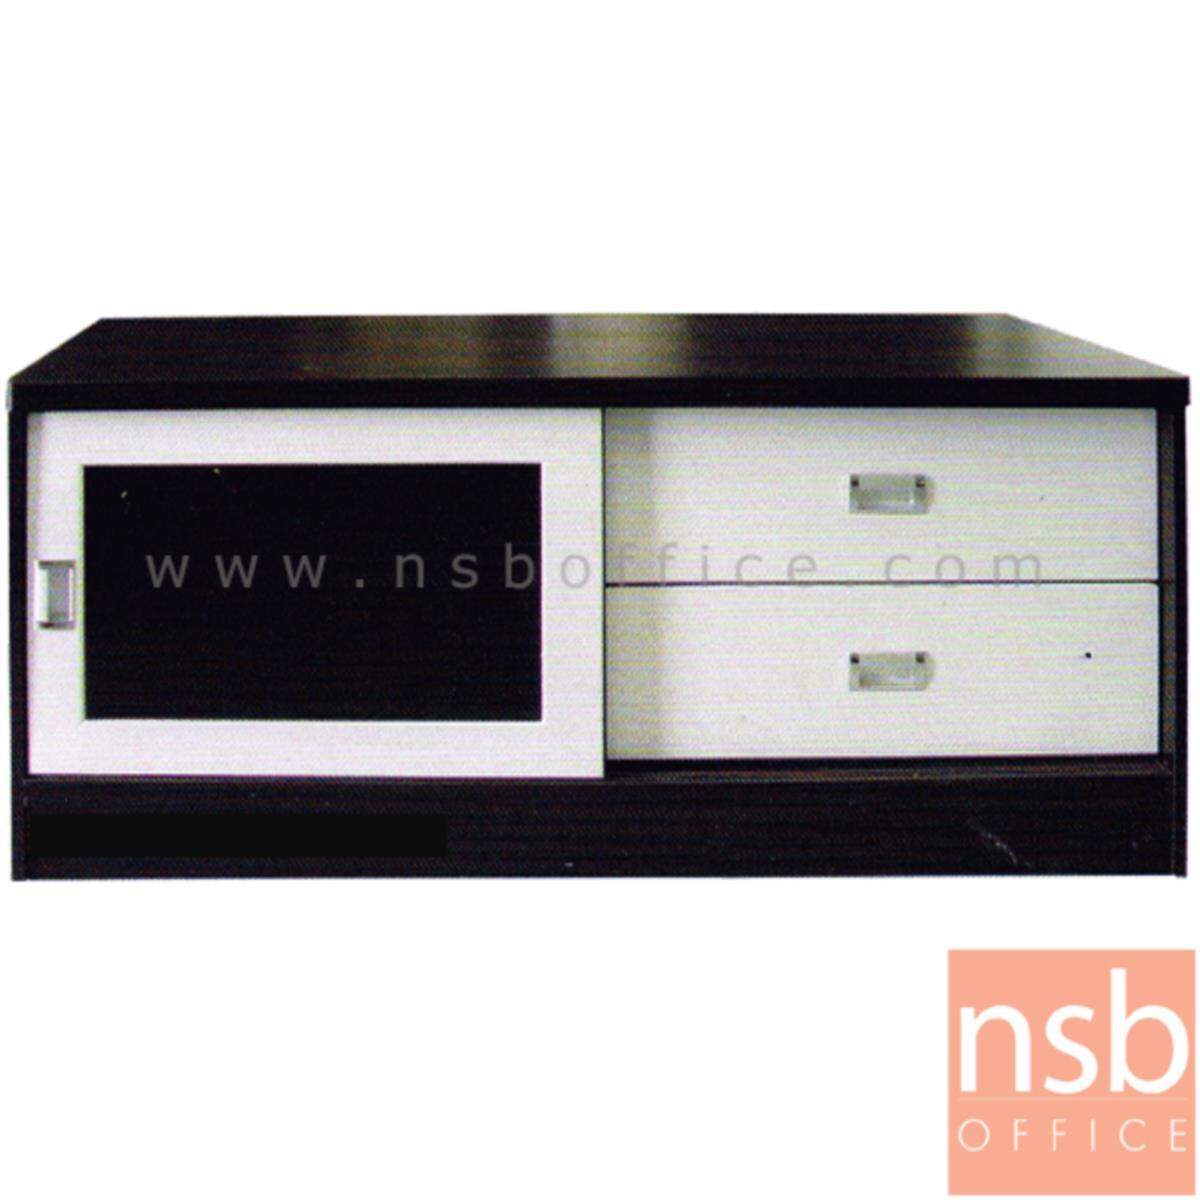 C08A019:ตู้วางทีวี 2 ลิ้นชัก 1 บานเลื่อนกระจก  รุ่น Darwell (ดาร์เวล) ขนาด 120W*55.5H cm.